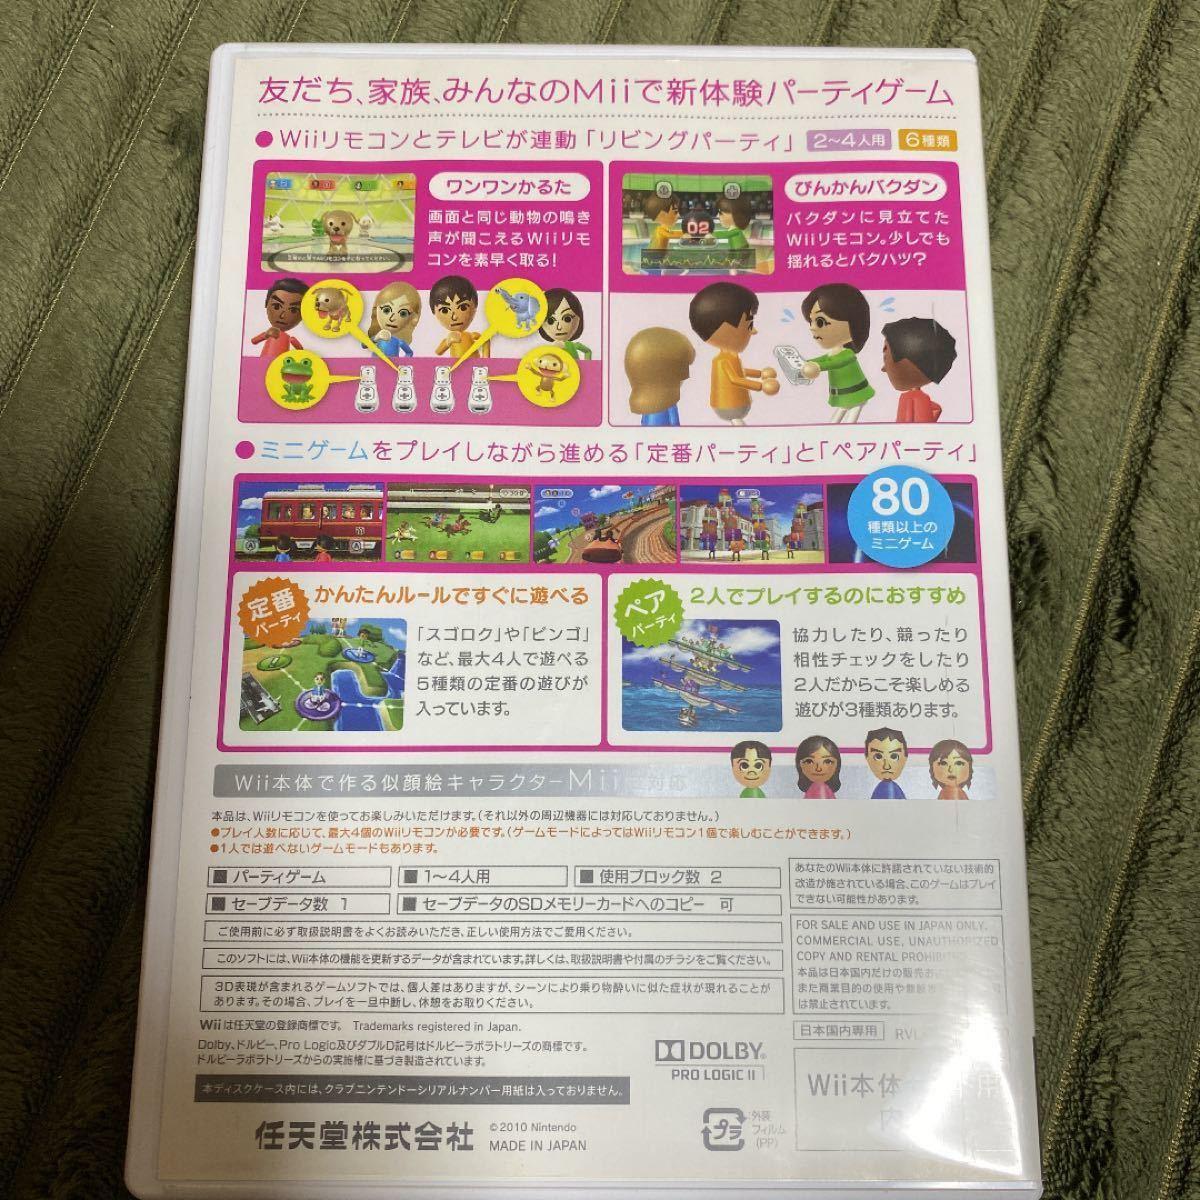 Wii 本体 コントローラー ヌンチャク ソフト